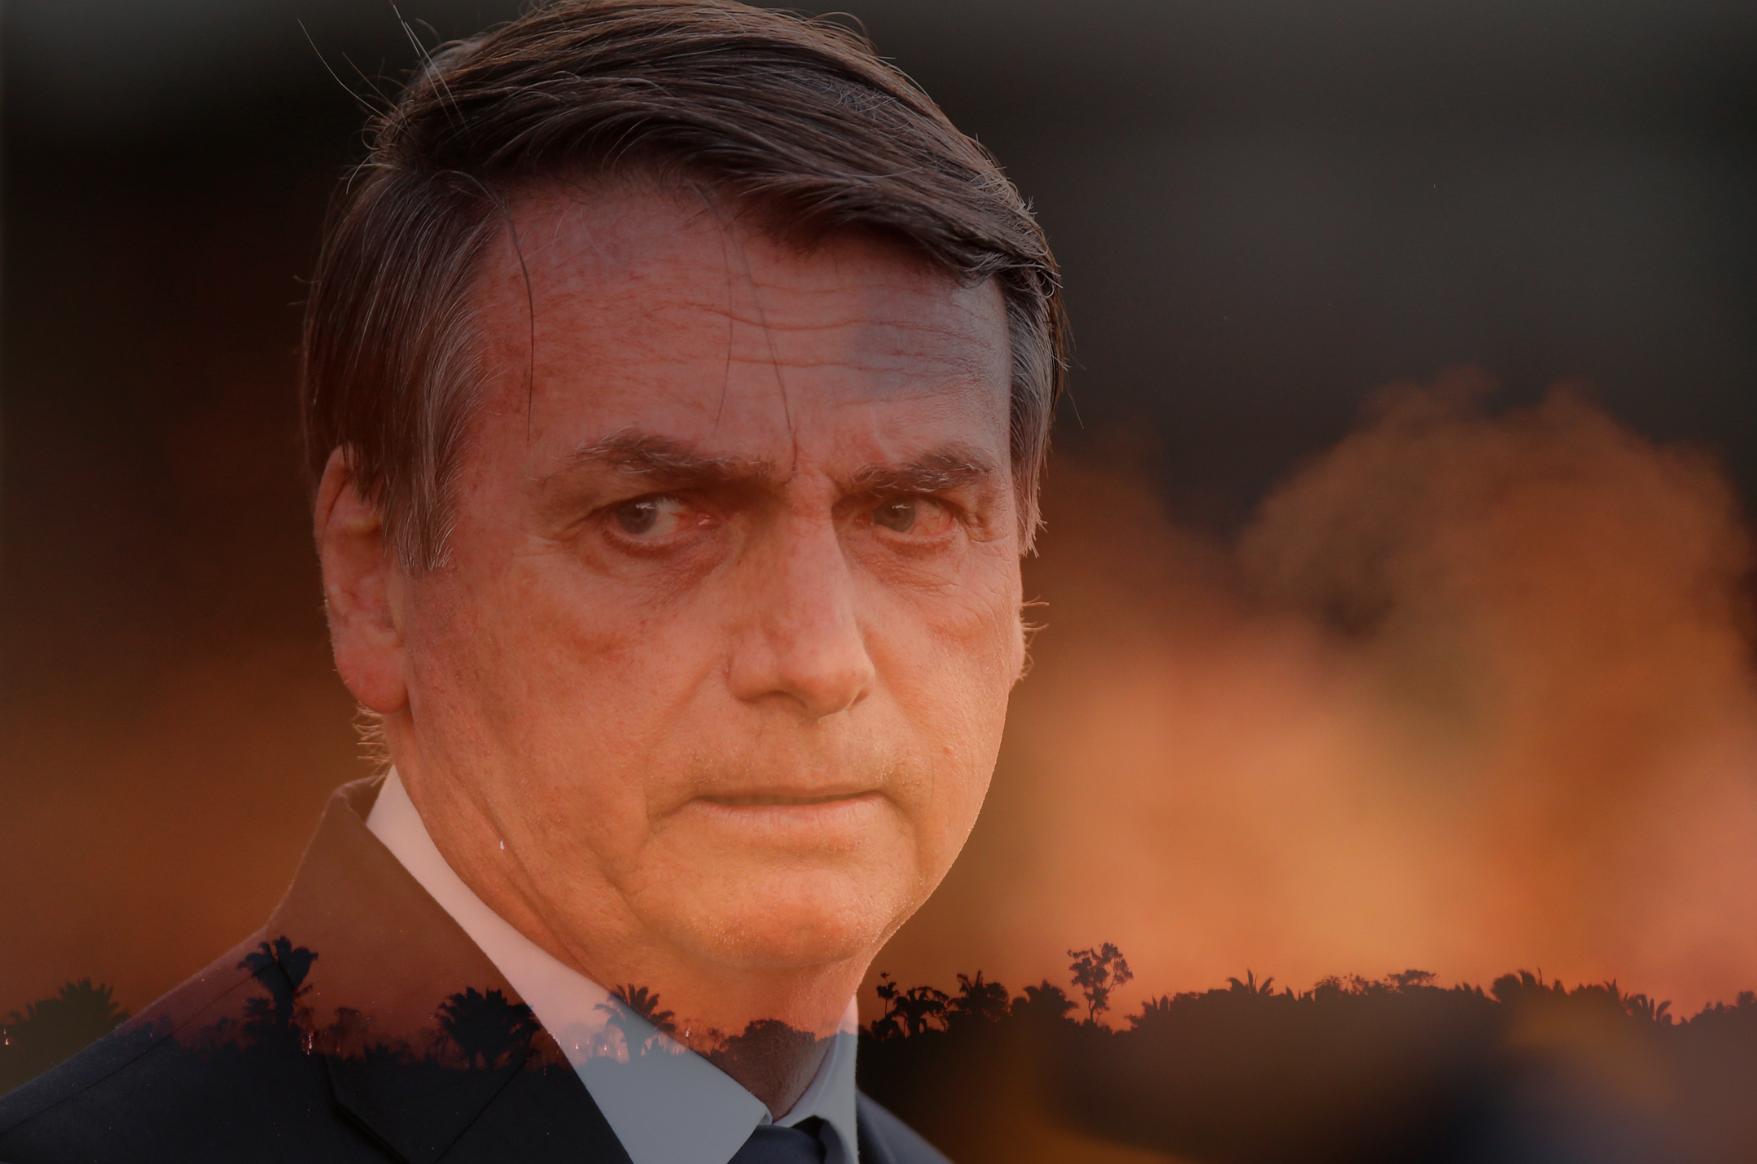 Procurili dokumenti: Bolsonaro aktivno radi da uništi Amazonu